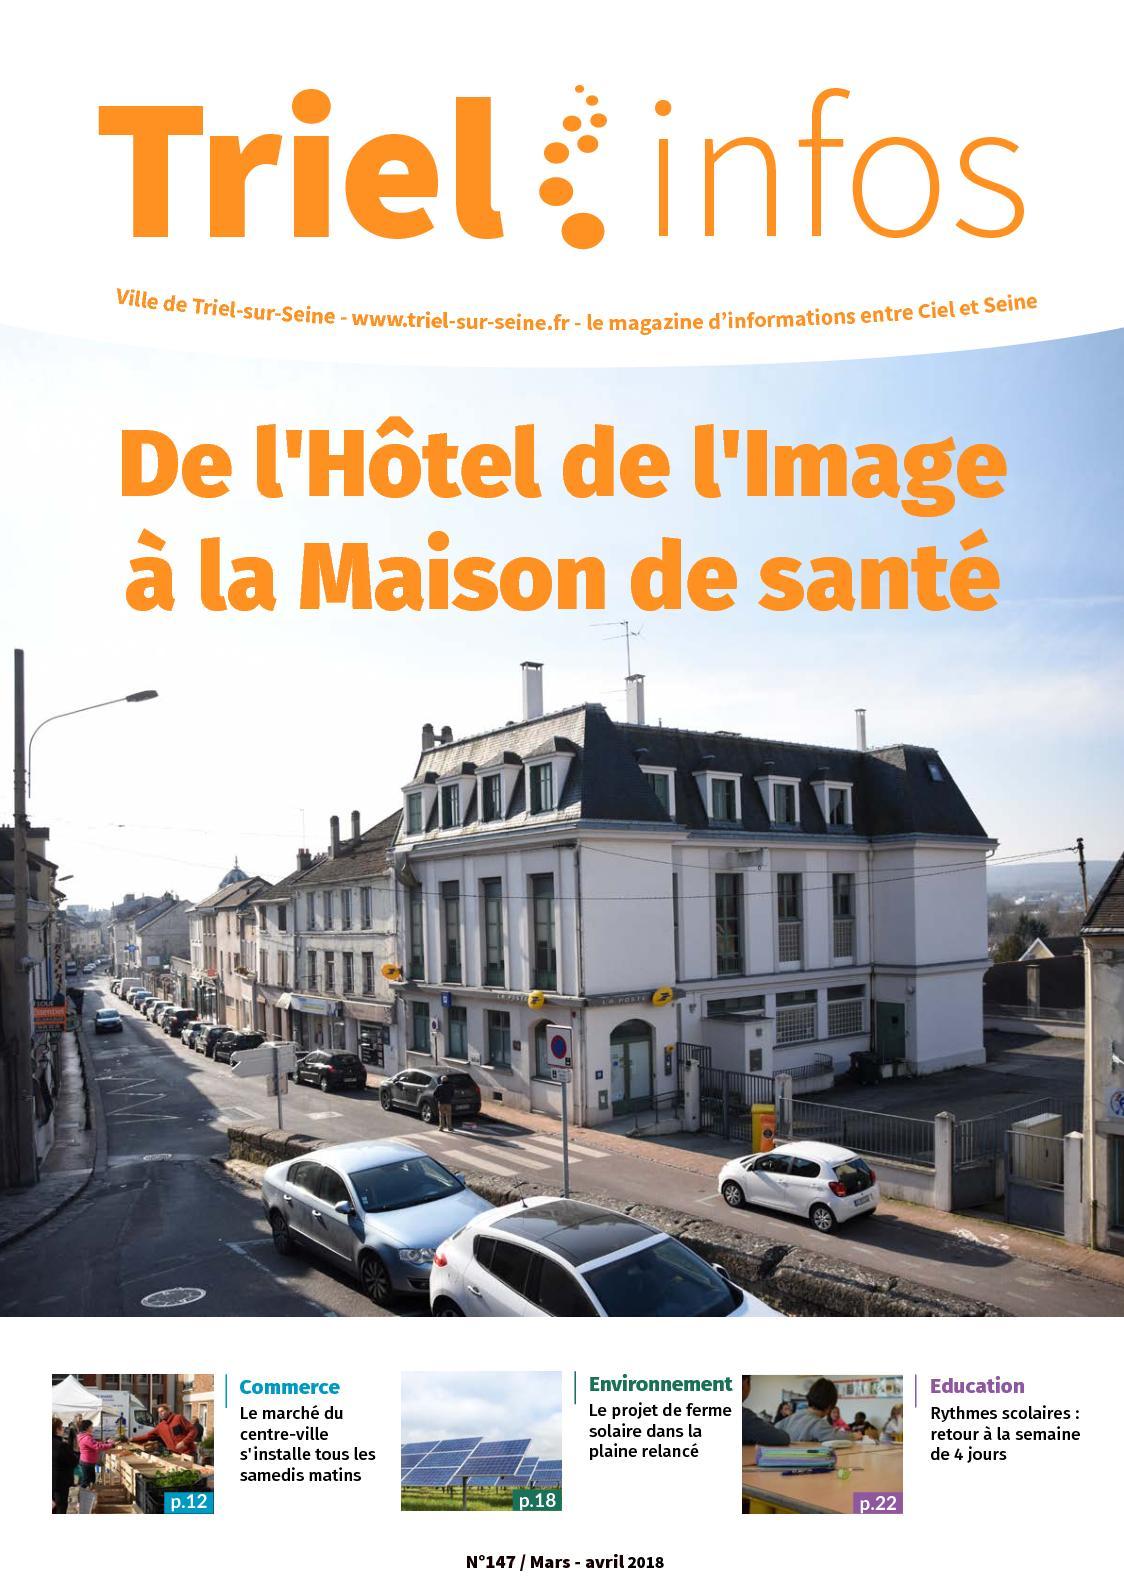 Triel Sur Seine Fr calaméo - triel infos 147 mars avril 2018